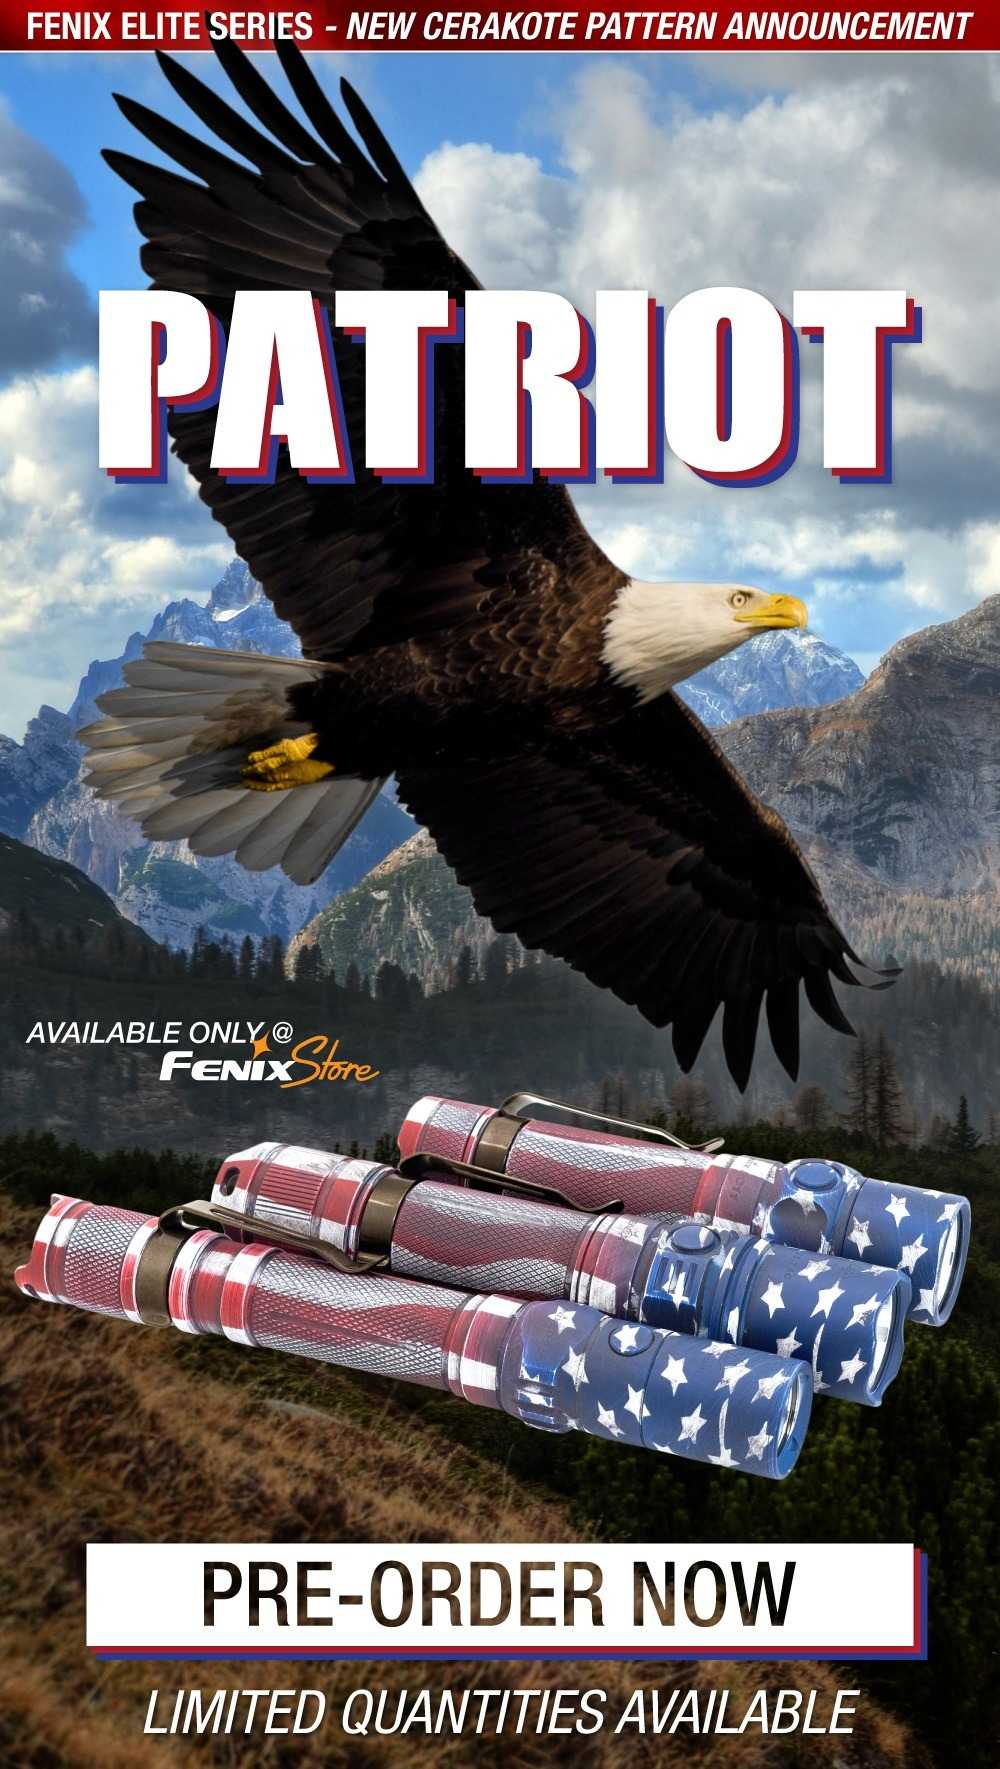 Fenix Elite Edition - Patriot Cerakote